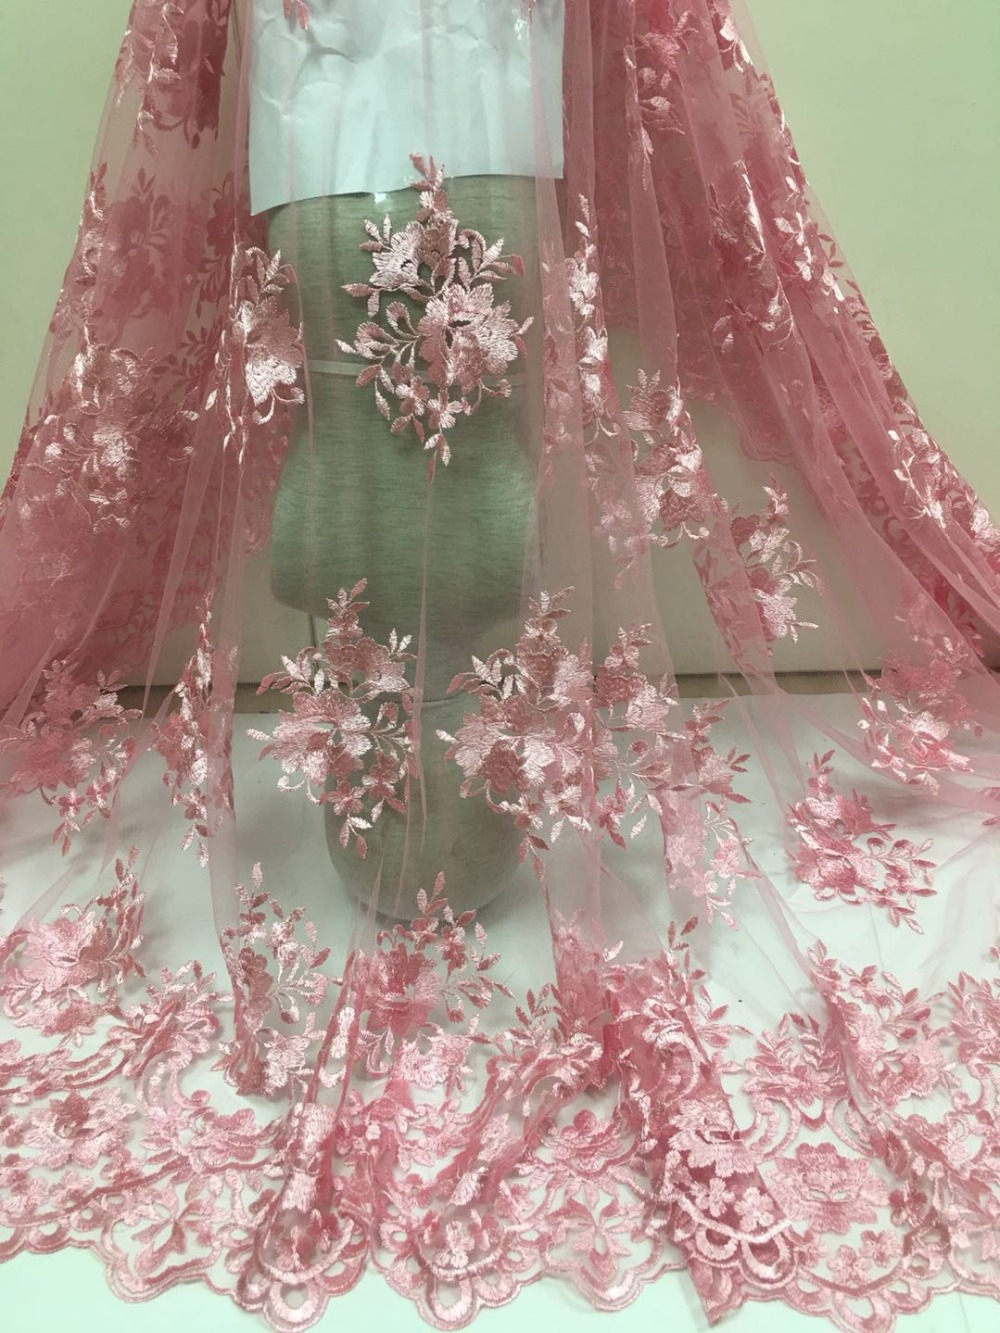 5 yards 결혼식을위한 로얄 블루 프랑스 그물 레이스 레이스 원단, 웨딩 드레스 용 고품질 아프리카 레이스 원단, 무료 배송-에서레이스부터 홈 & 가든 의  그룹 3